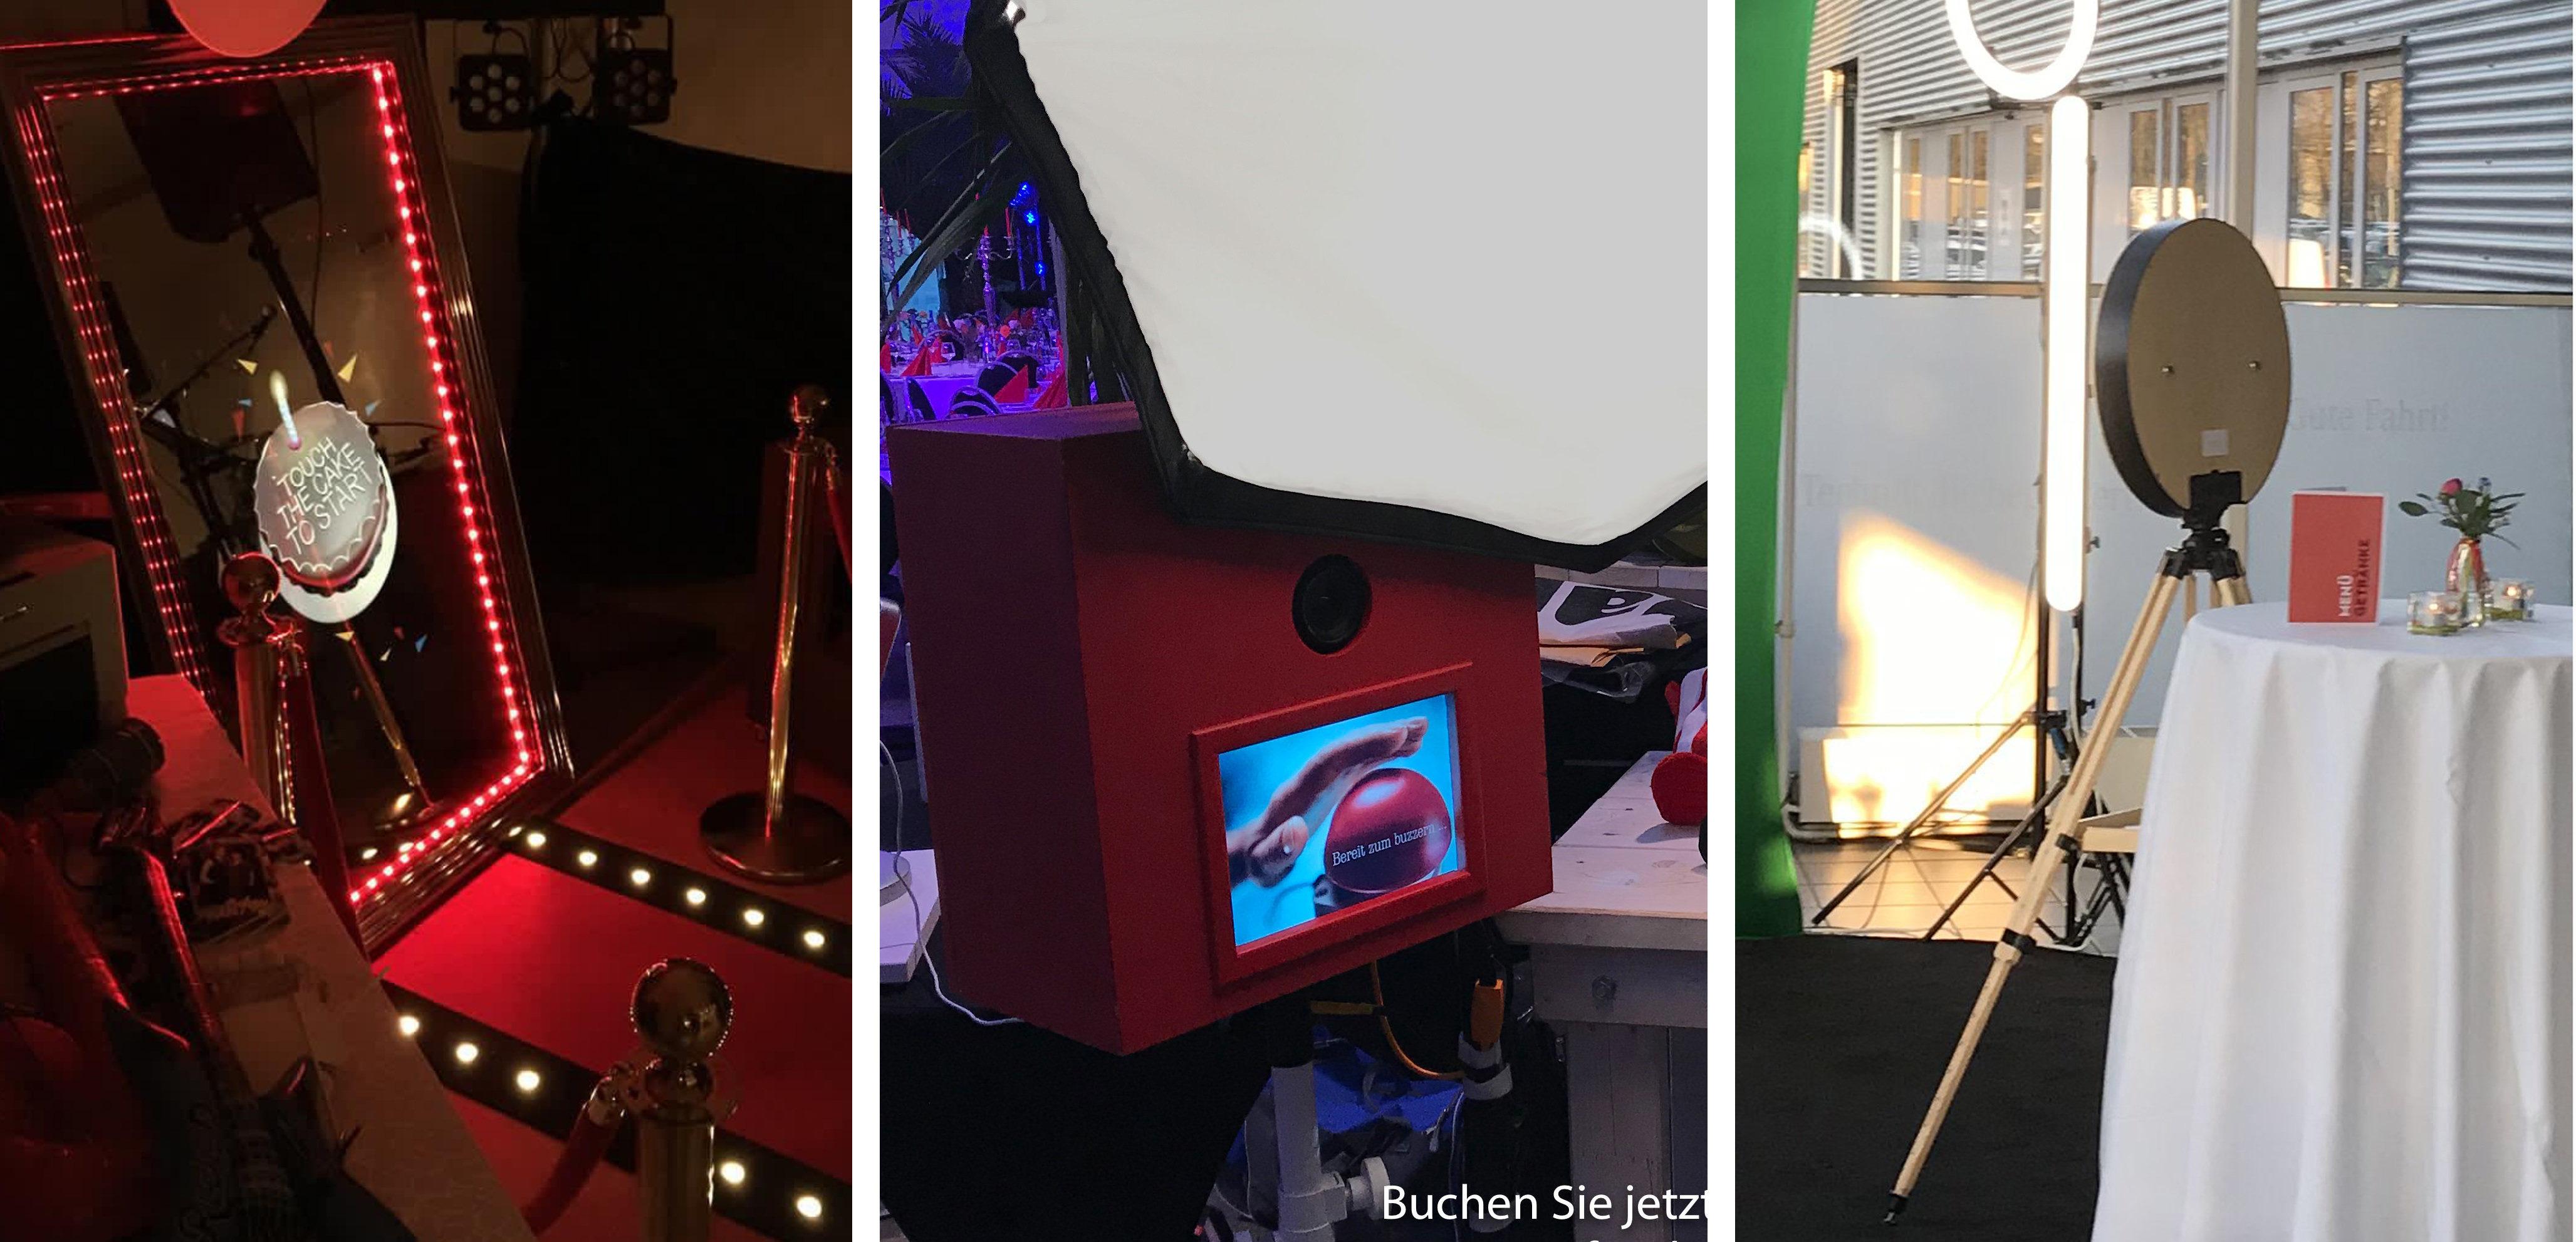 Fotobox Bremen Übersicht e1560303038404 - Fotobox Bremen mieten